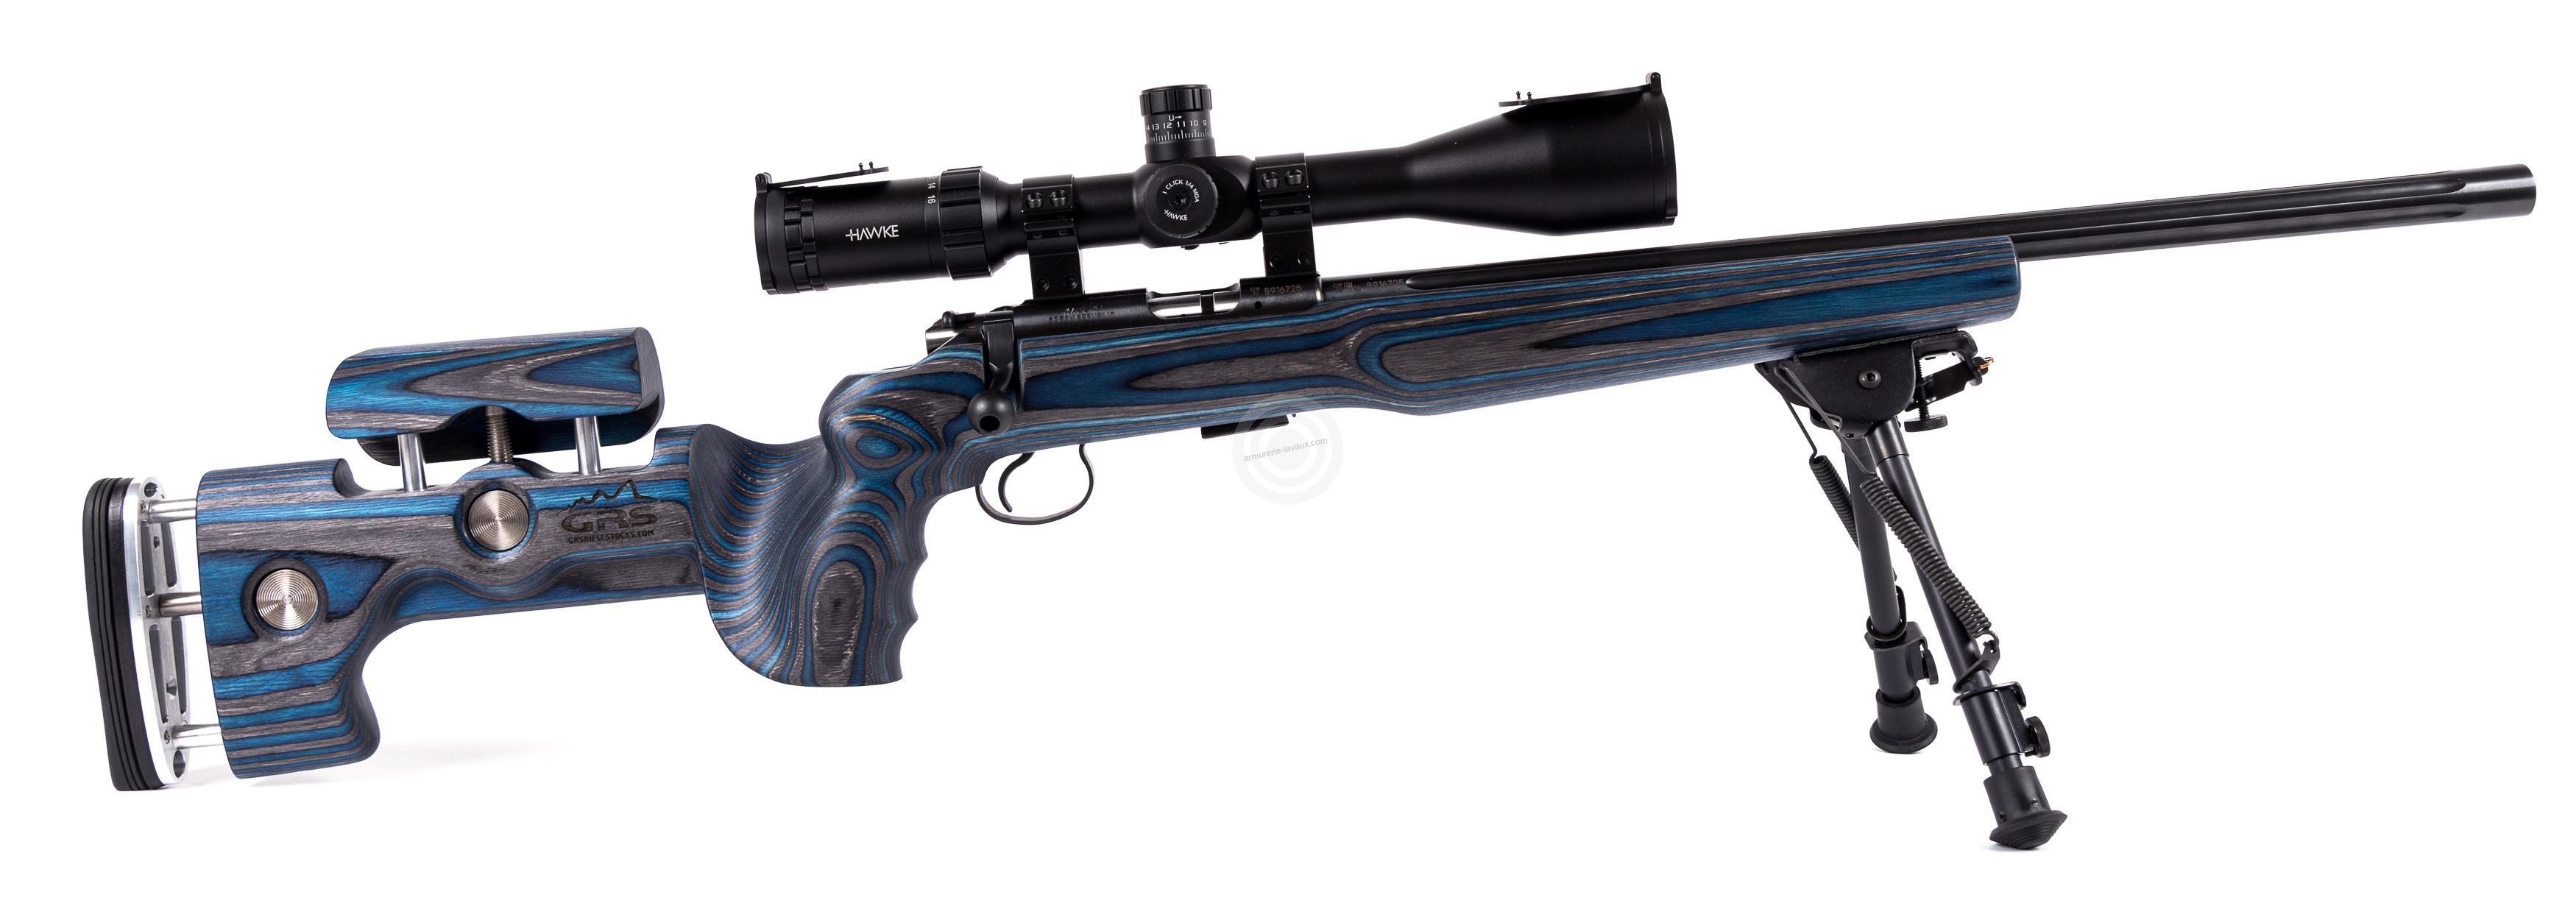 Carabine 22lr cz 455 varmint grs avec lunette hawke - Crosse cz 455 ...